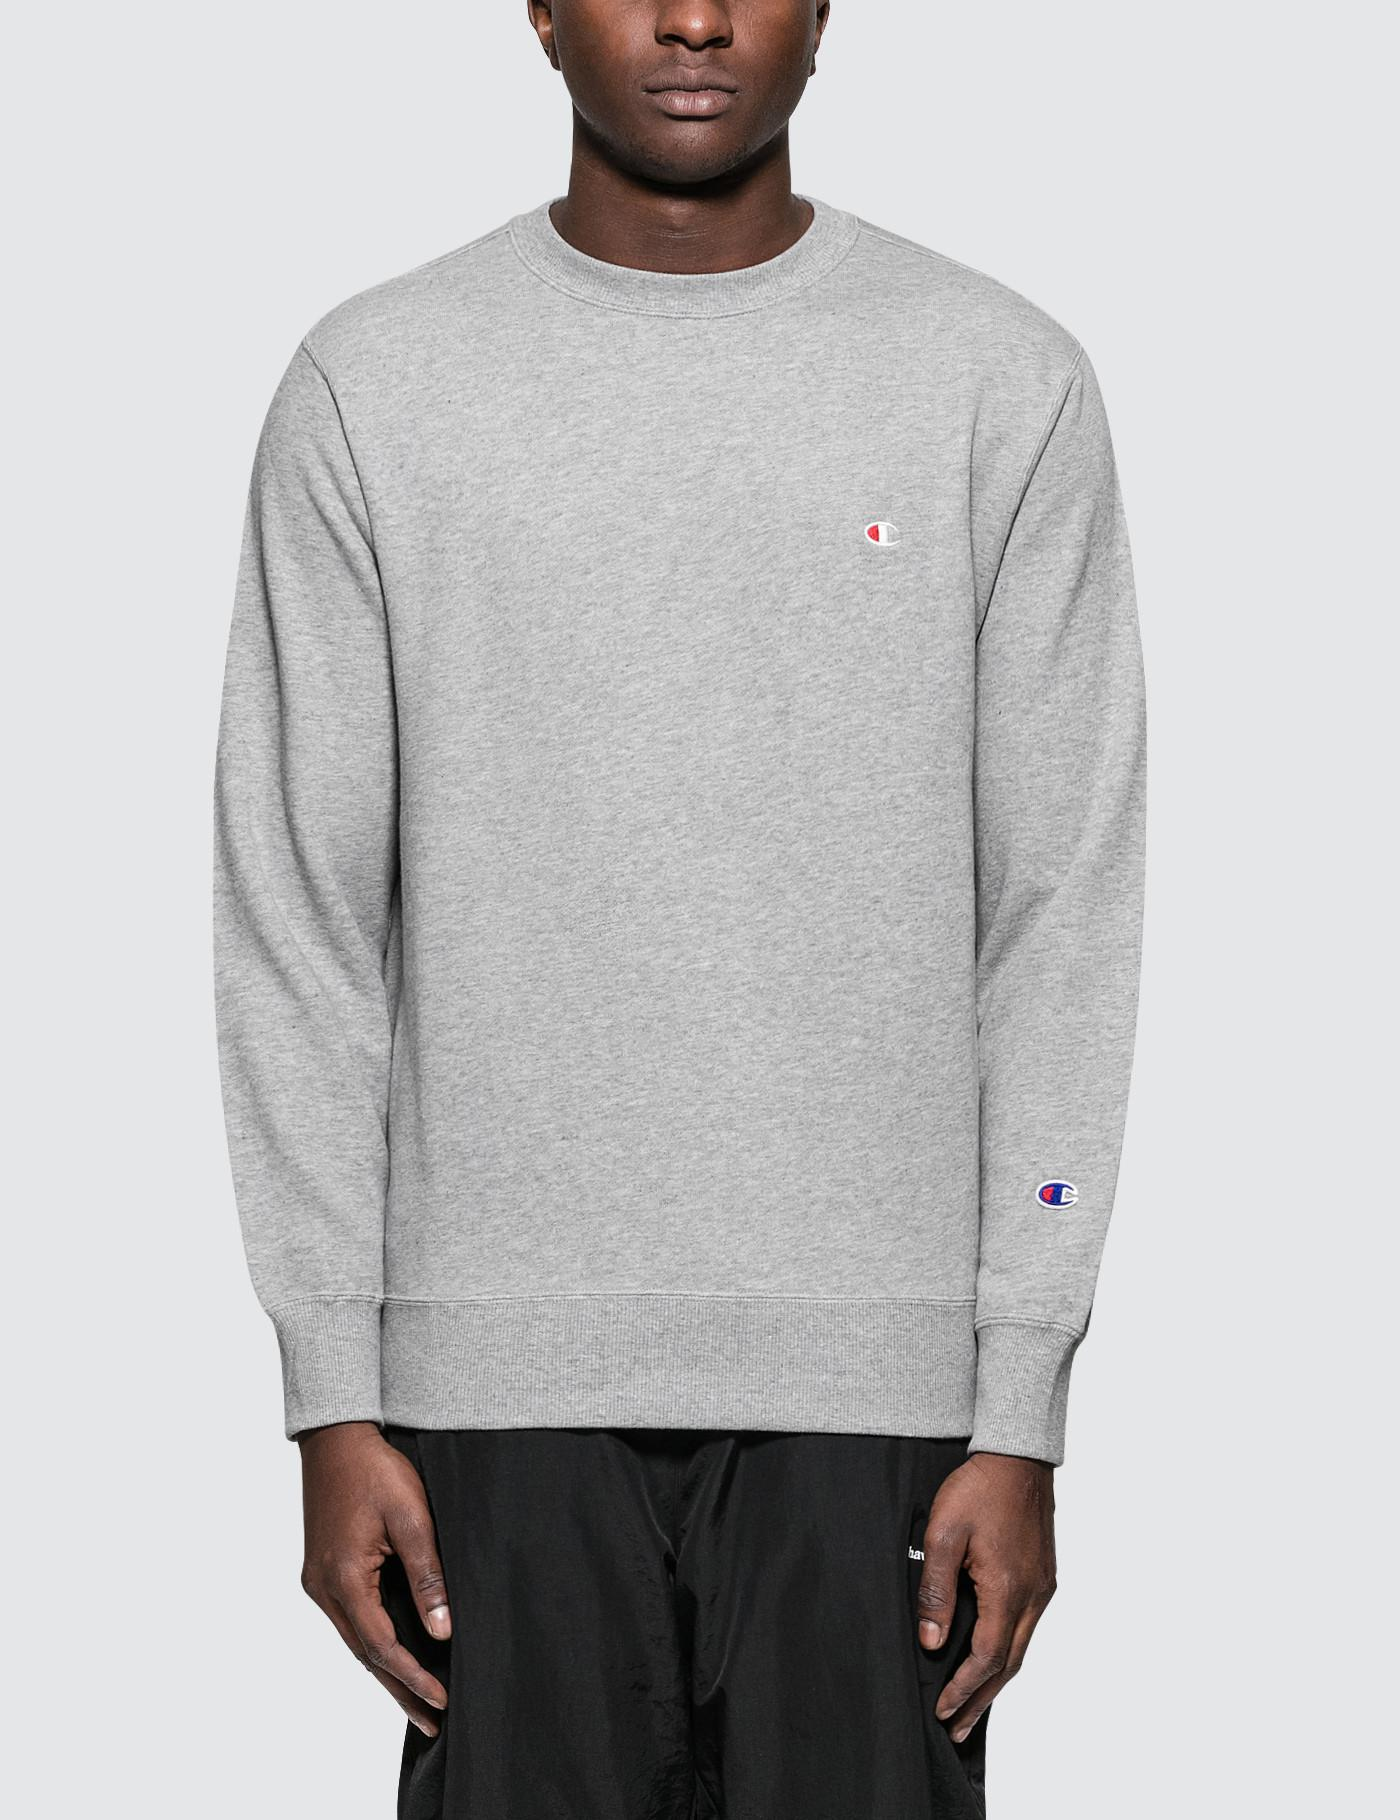 bdcd6bf3 Champion Small Logo Sweatshirt in Gray for Men - Lyst